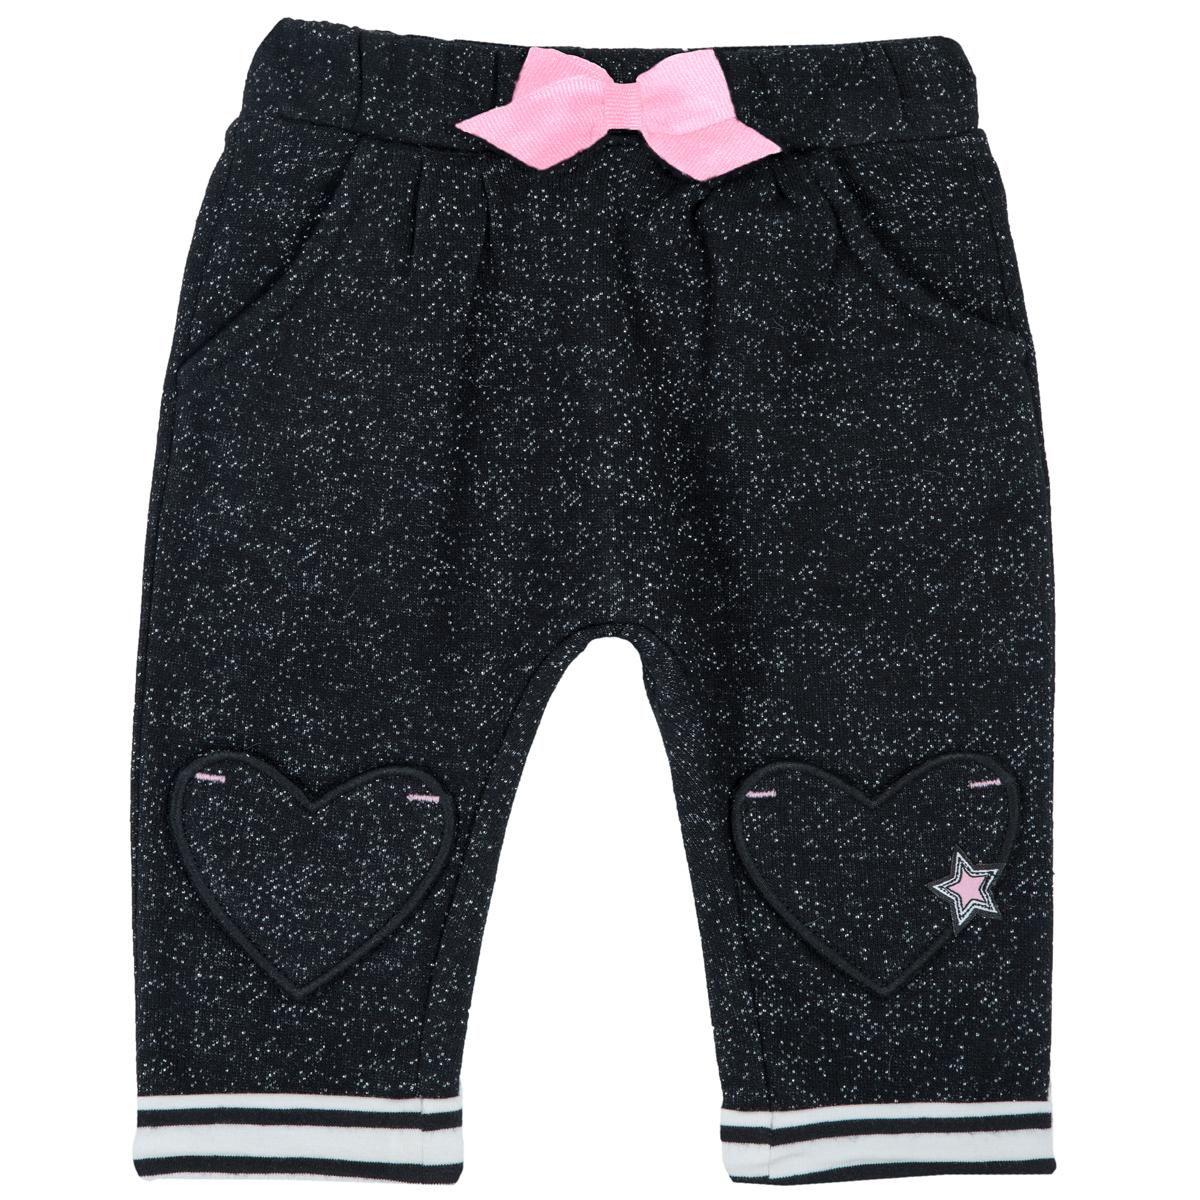 Pantaloni lungi sport copii Chicco, fundita roz, 24996